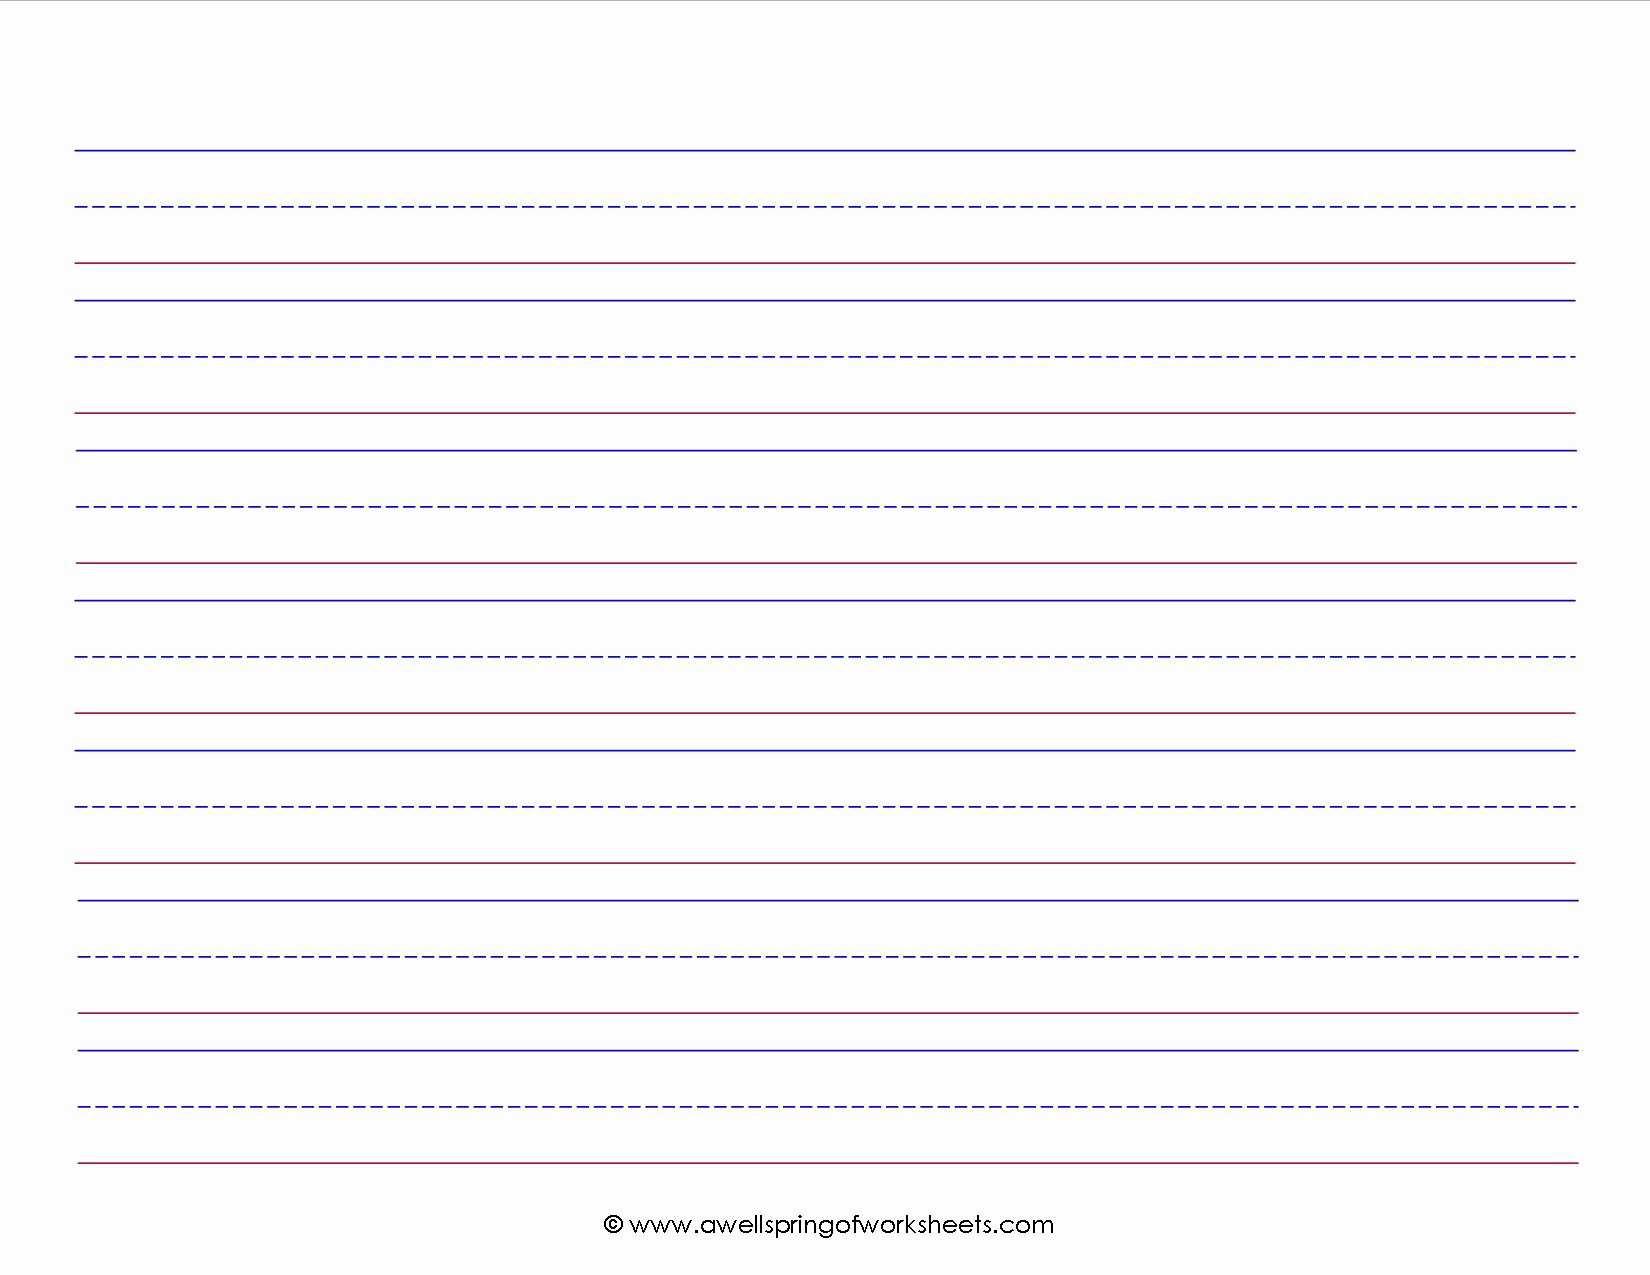 Kindergarten Letter Writing Paper Elegant Best S Of Primary Paper Template Kindergarten Lined